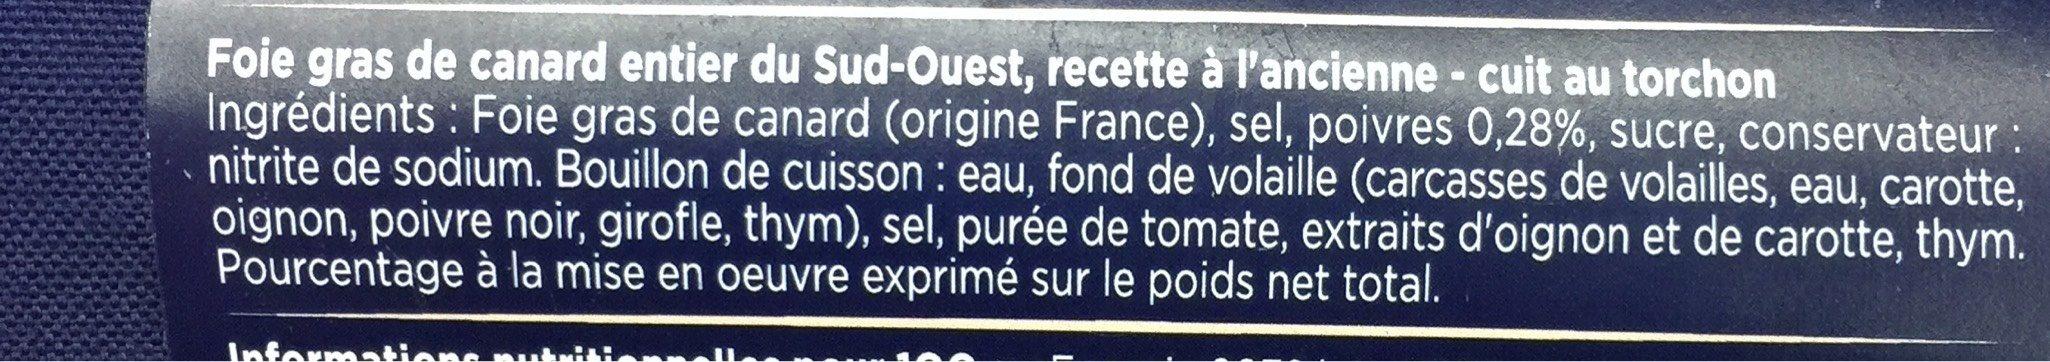 Foie gras de canard entier - Nutrition facts - fr